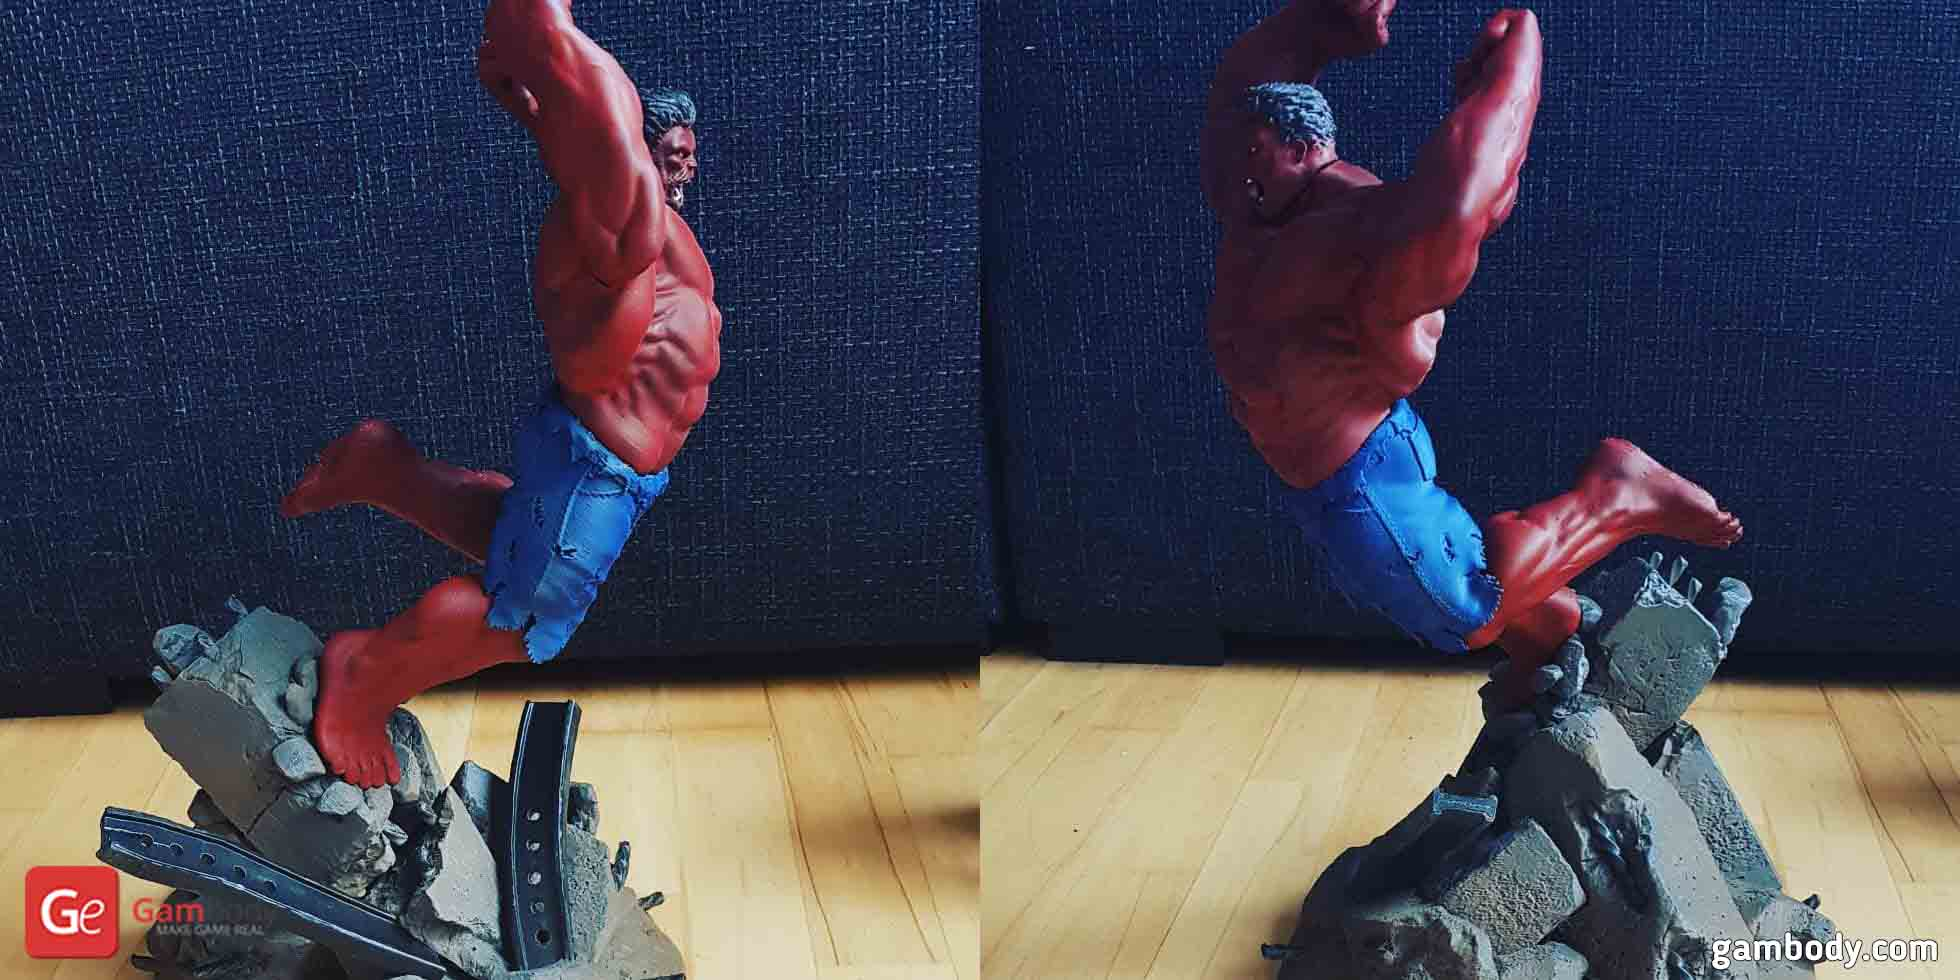 Red Hulk 3D Printing Figurine